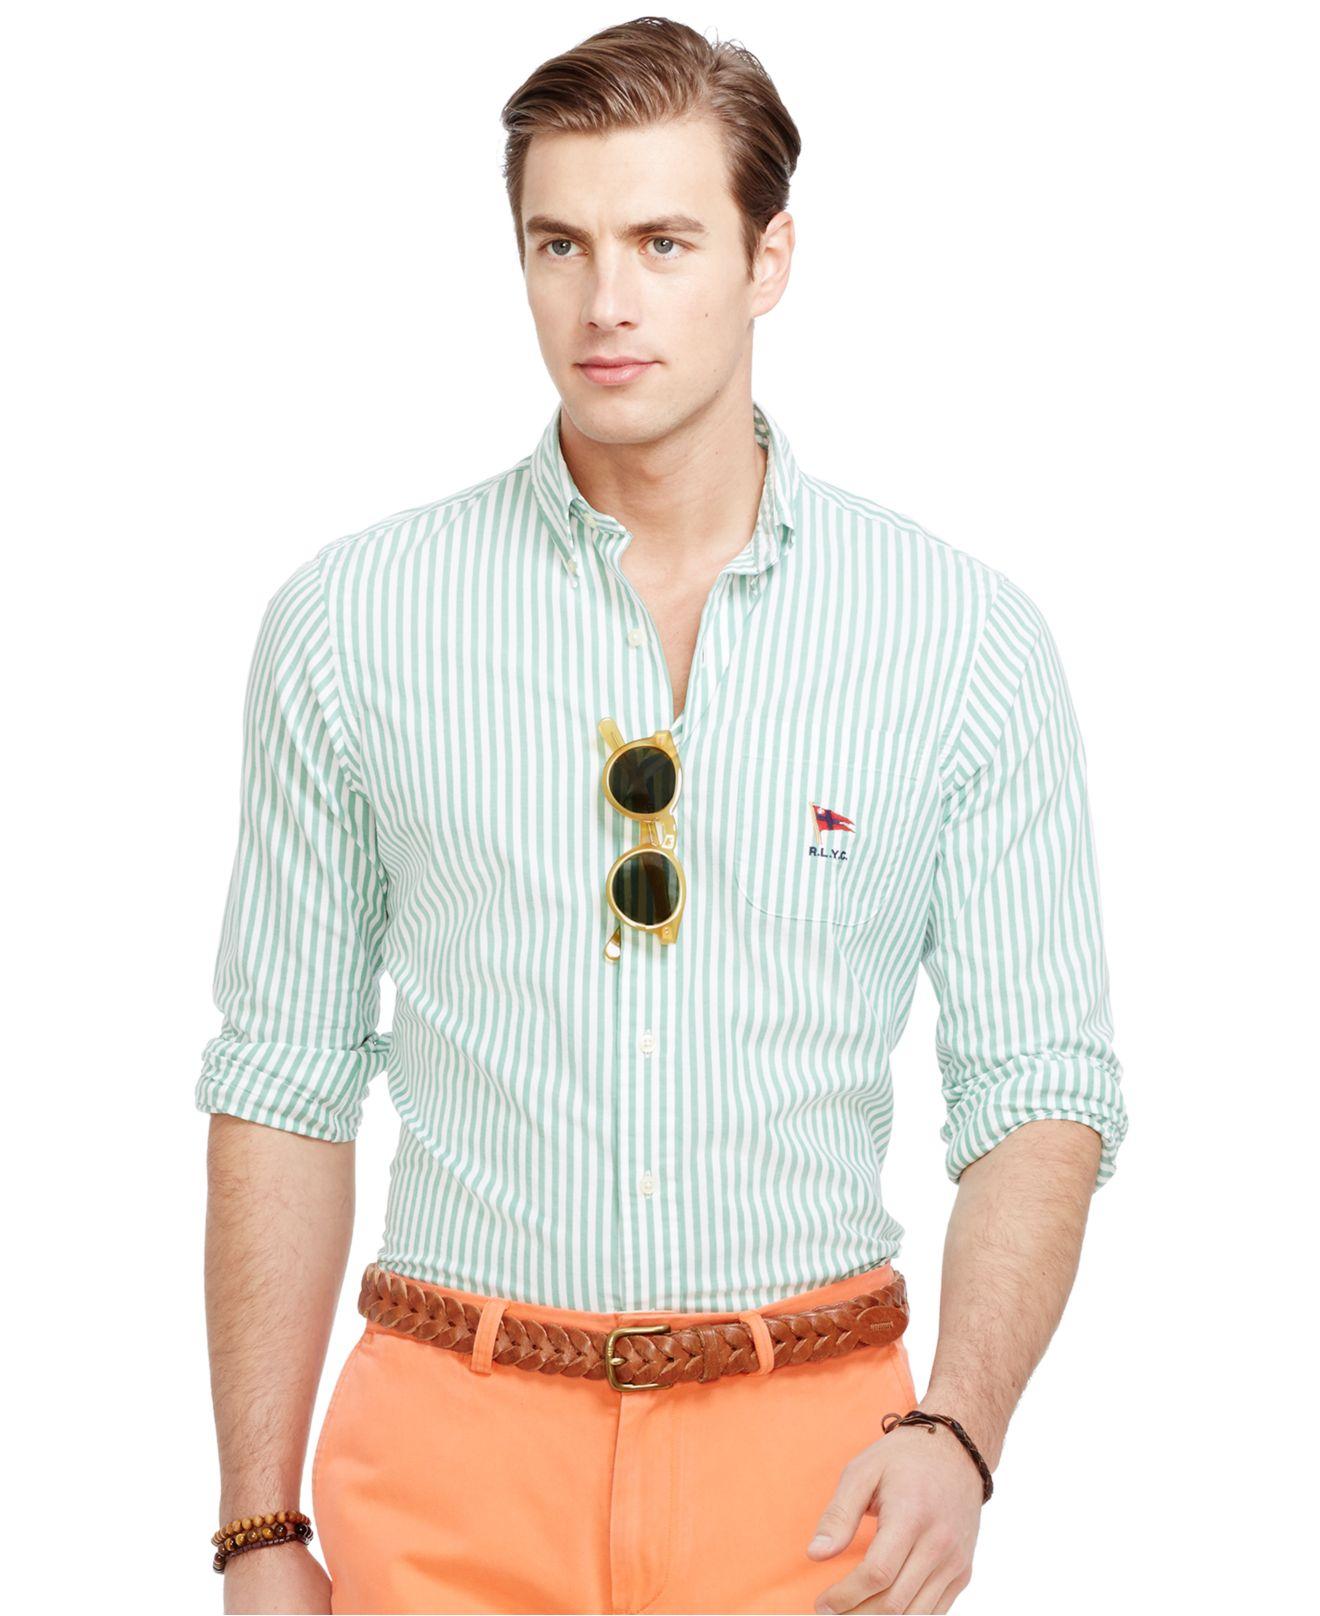 39db64dd21db9 ... shopping lyst polo ralph lauren striped oxford mercer shirt in green  for men ff54f dc0e6